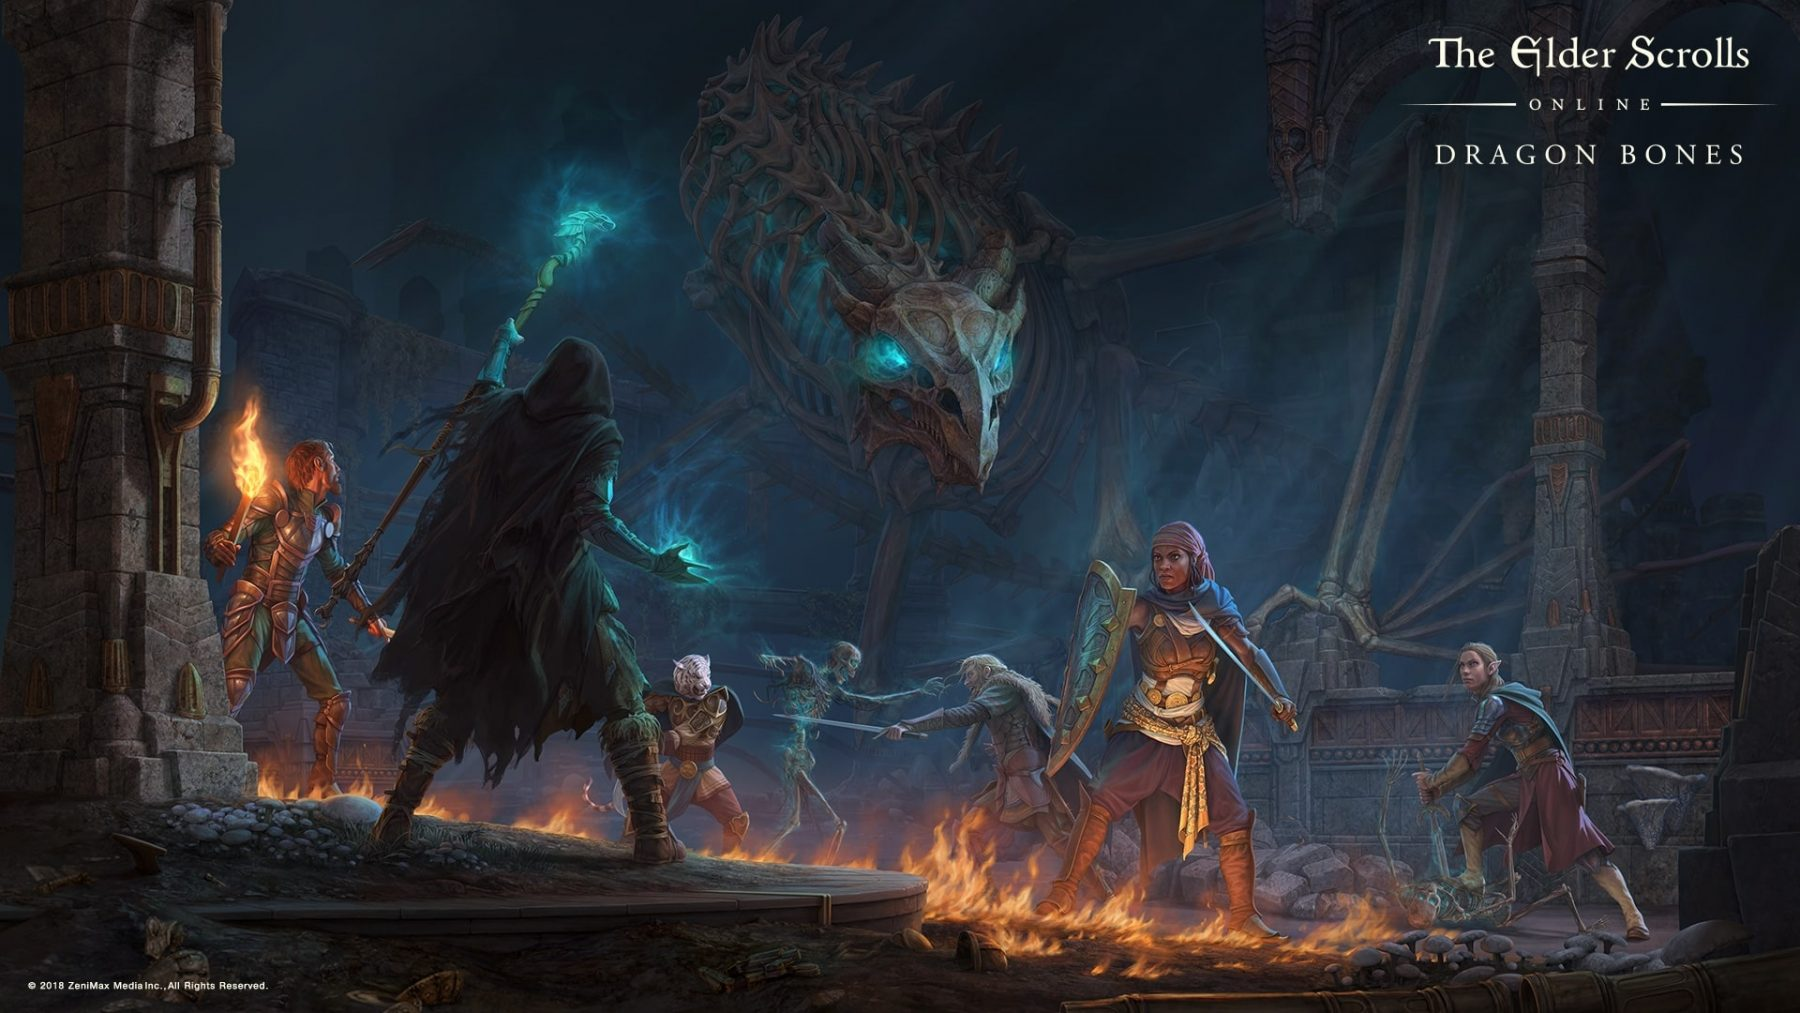 The Elder Scrolls Online Hd Wallpapers 7wallpapers Net